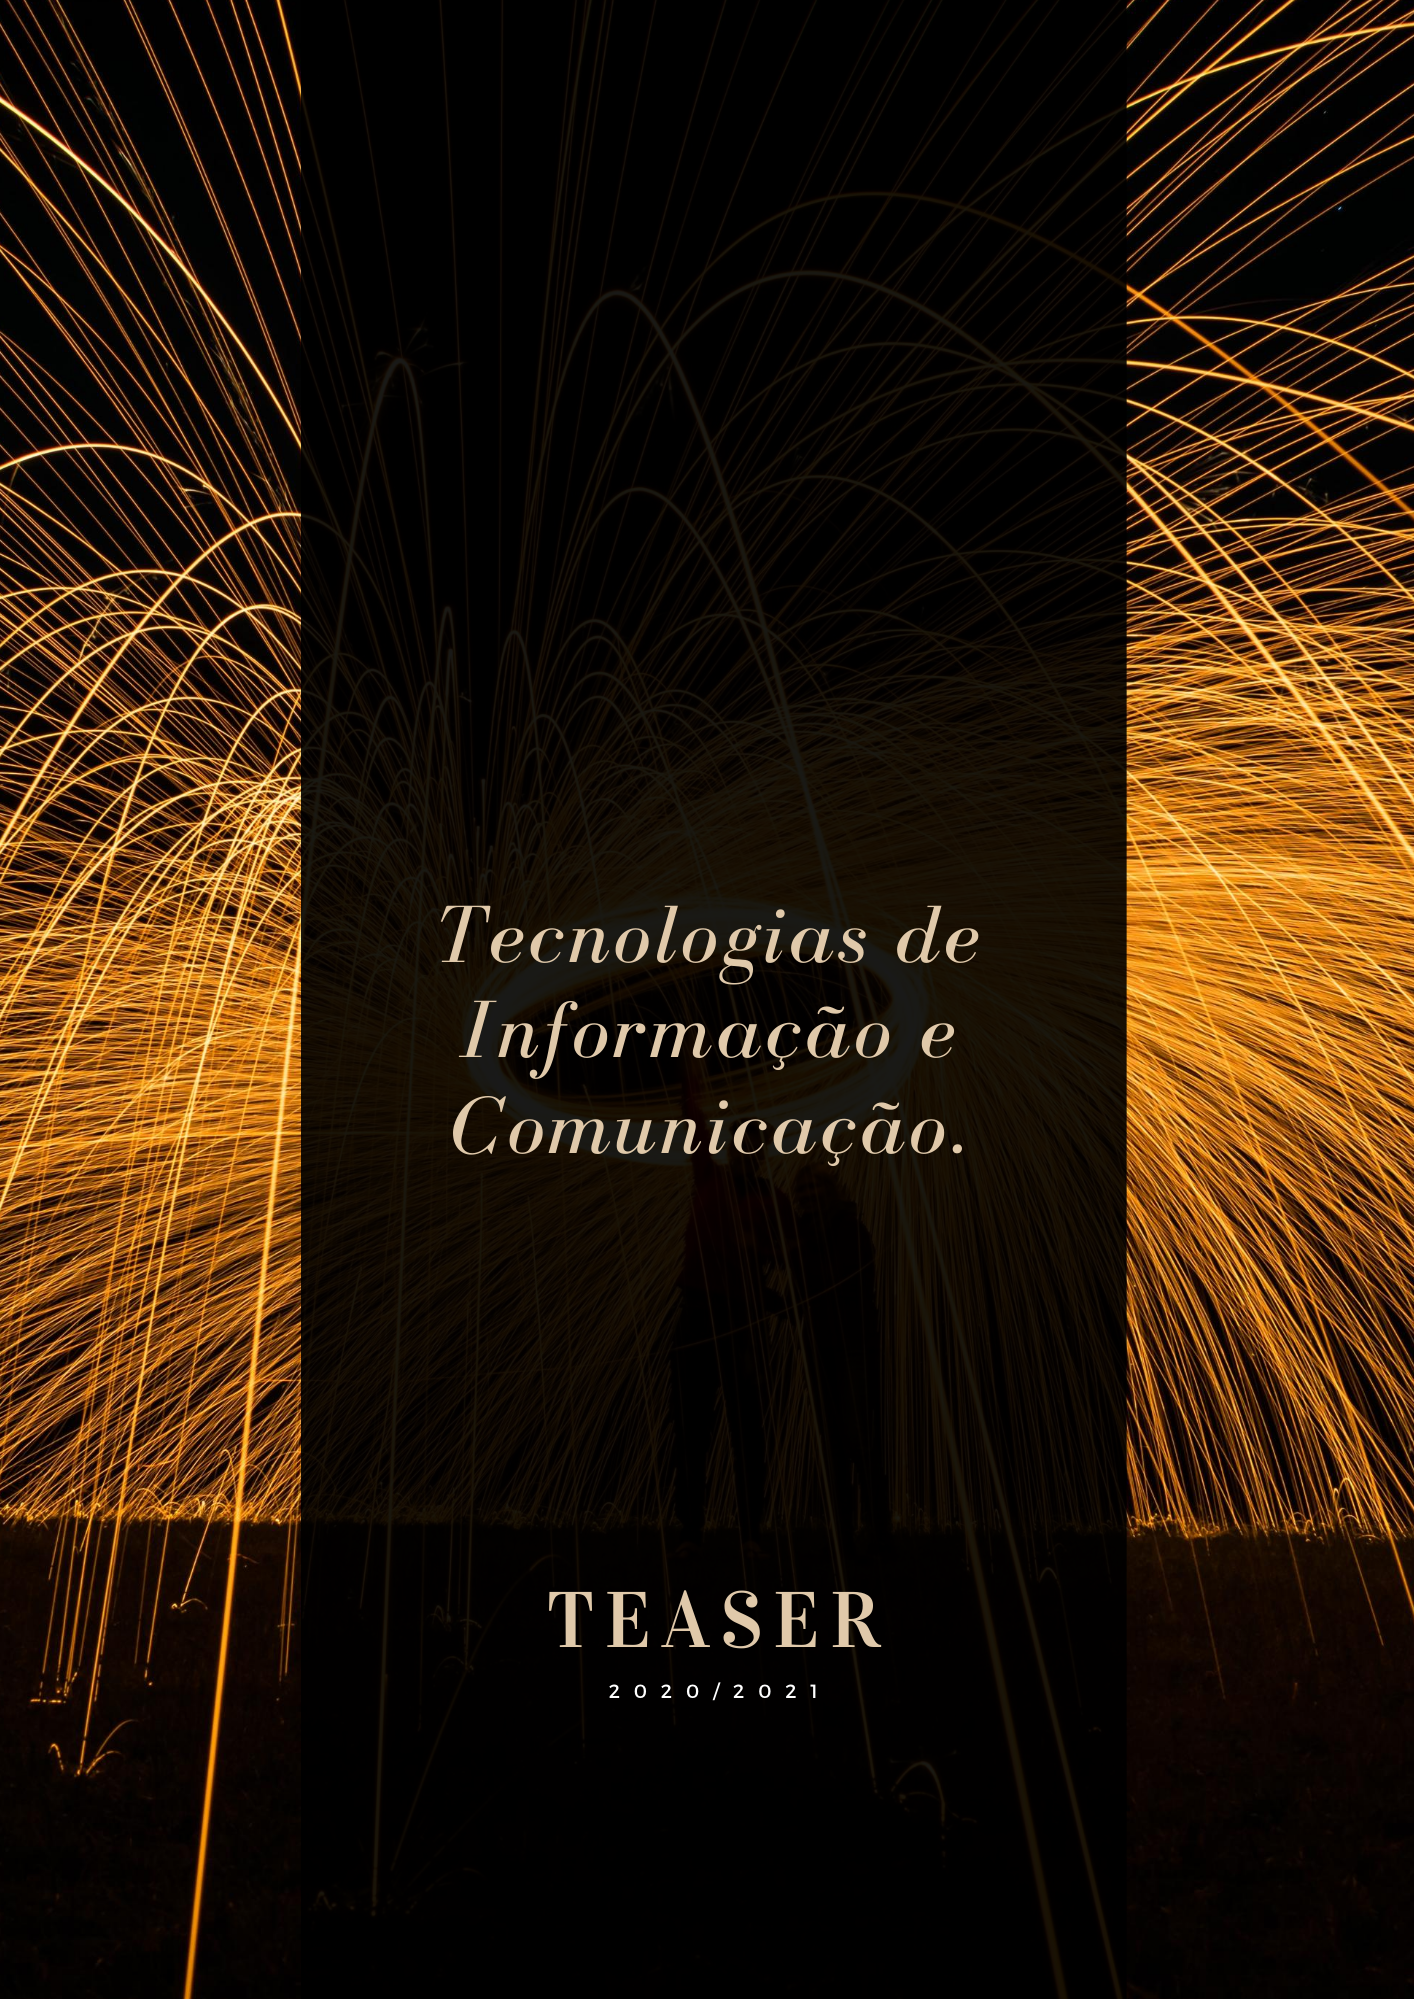 TIC .:. TEASER .:. 2020/2021